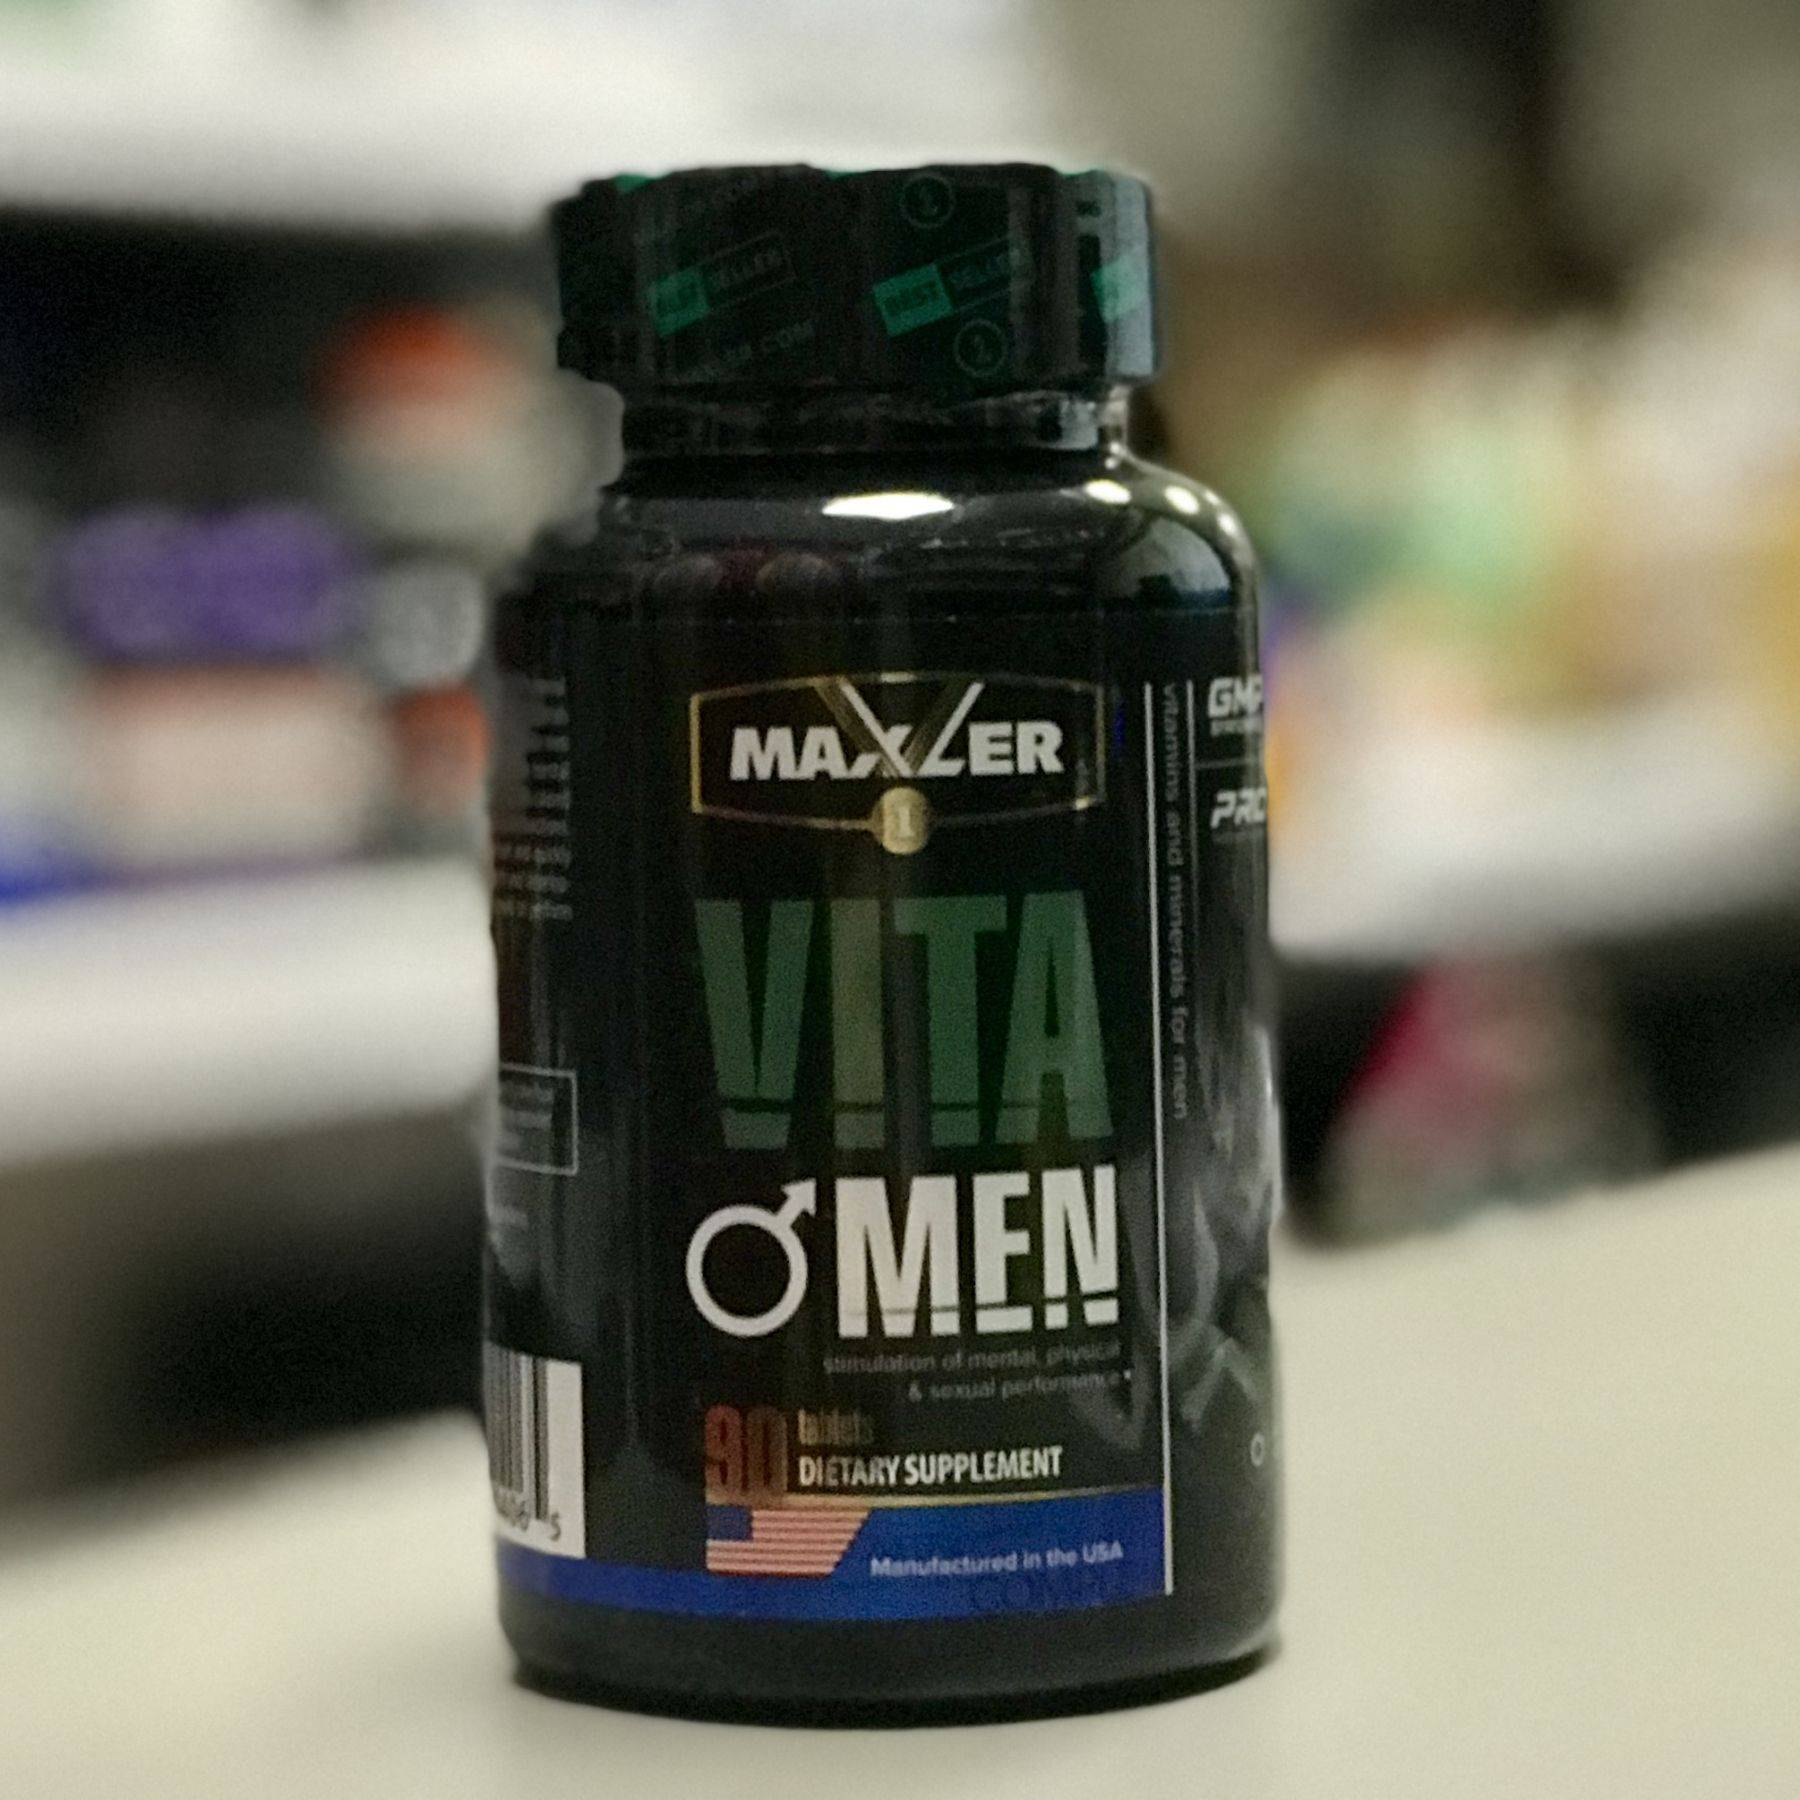 Vitamen 90 табл (maxler)